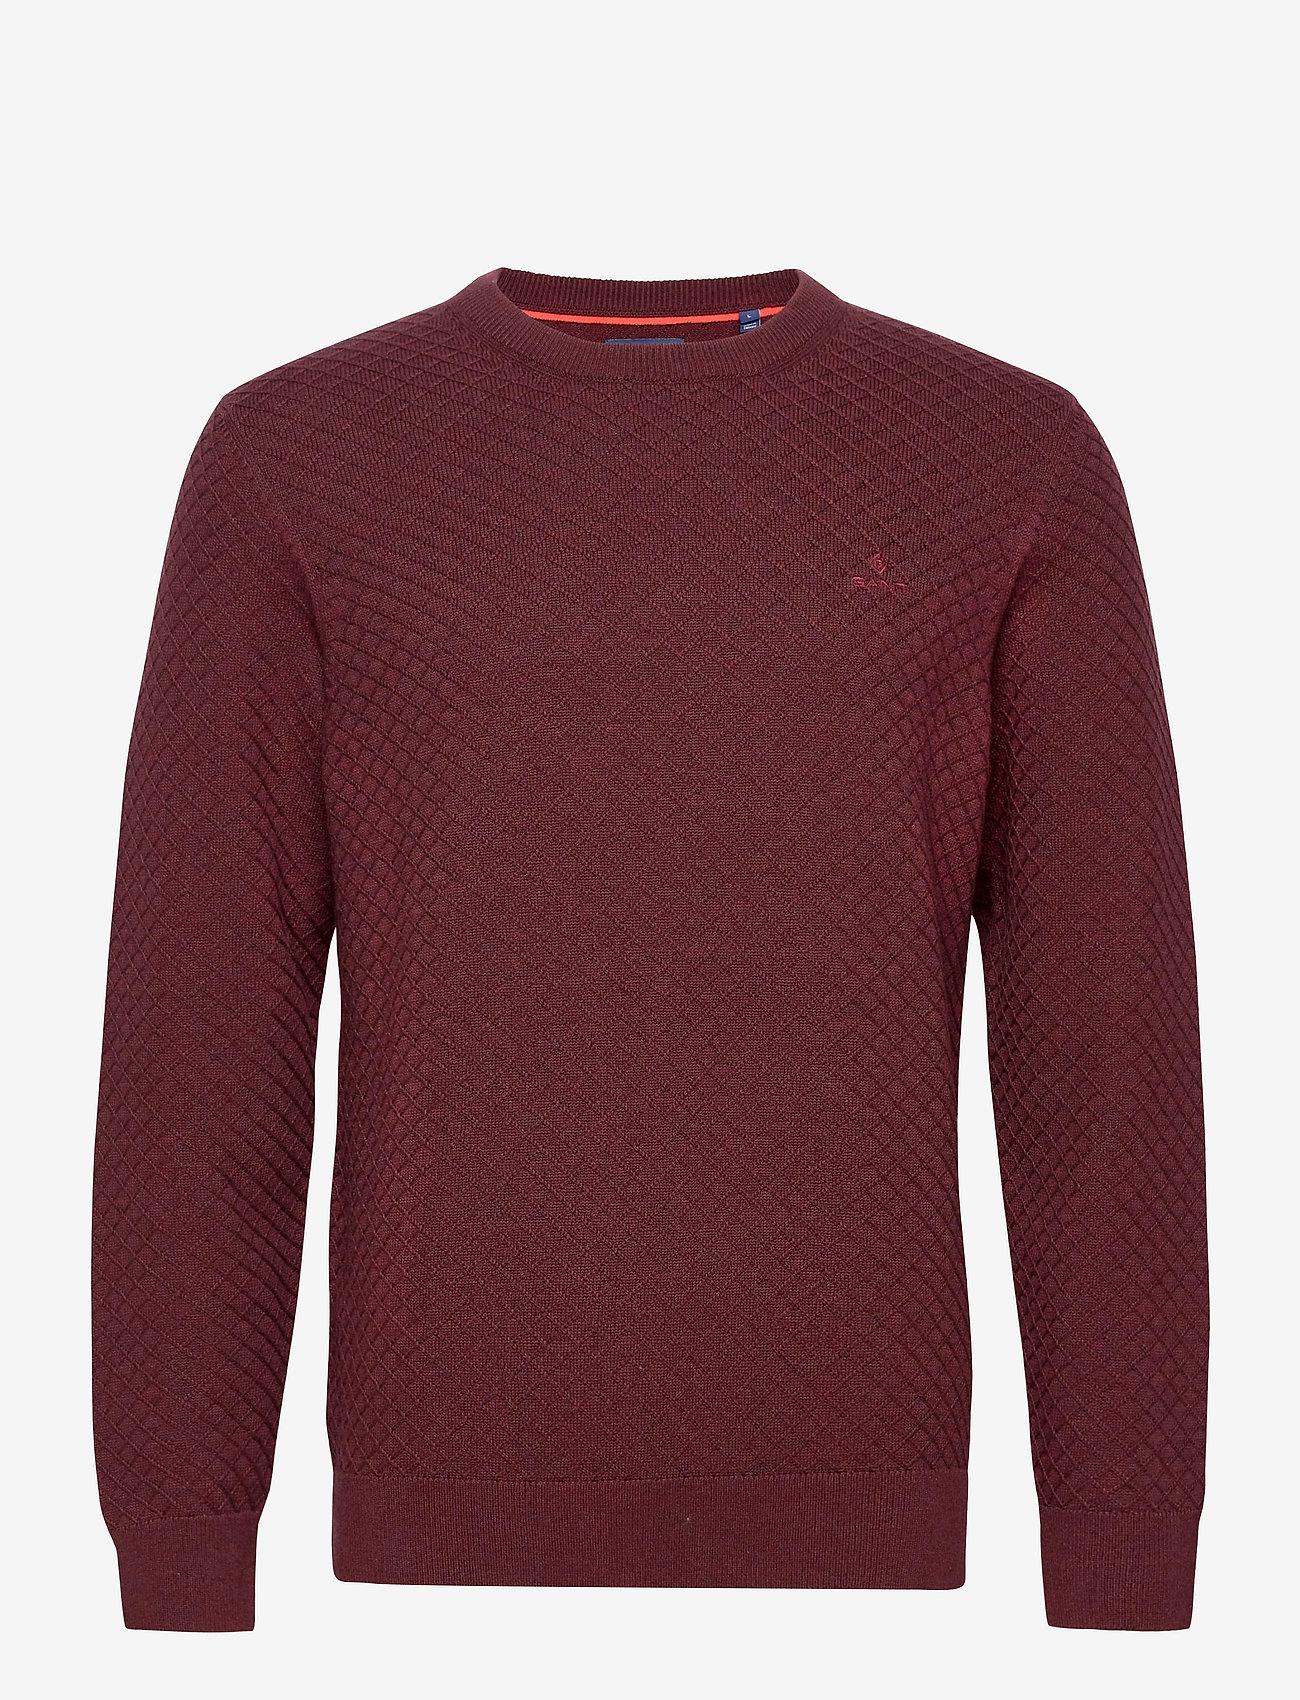 GANT - D1. COTTON TEXTURE CREW - basic knitwear - dk. burgundy mel - 0